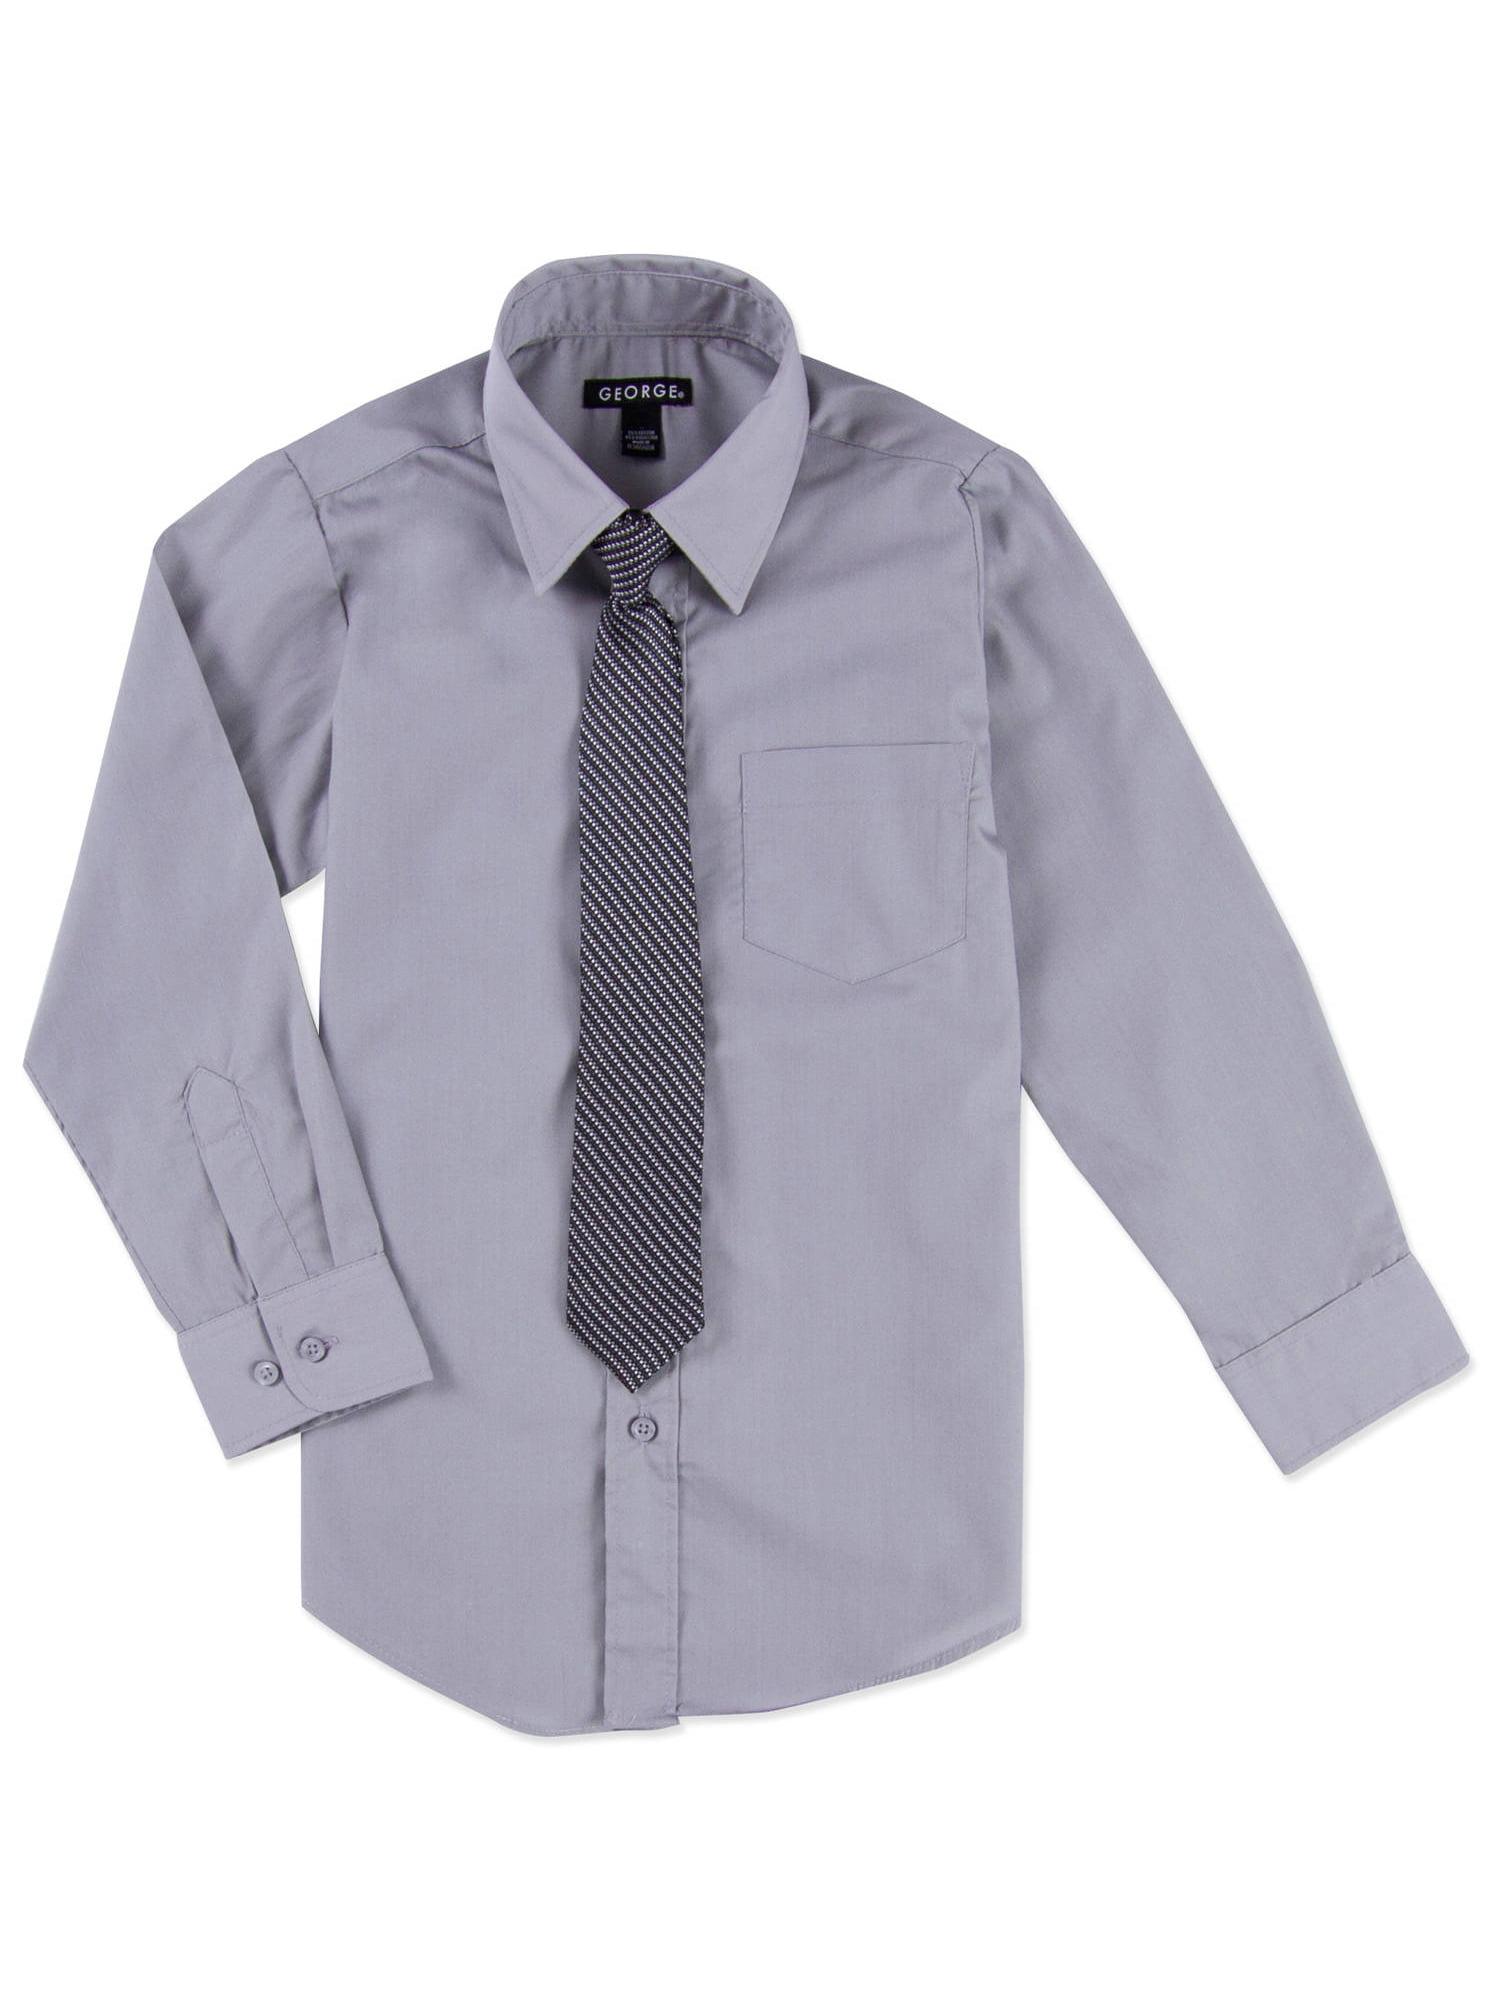 Boys Blue /& White Checked Dess Shirt w// Clip-On Tie Size 14//16